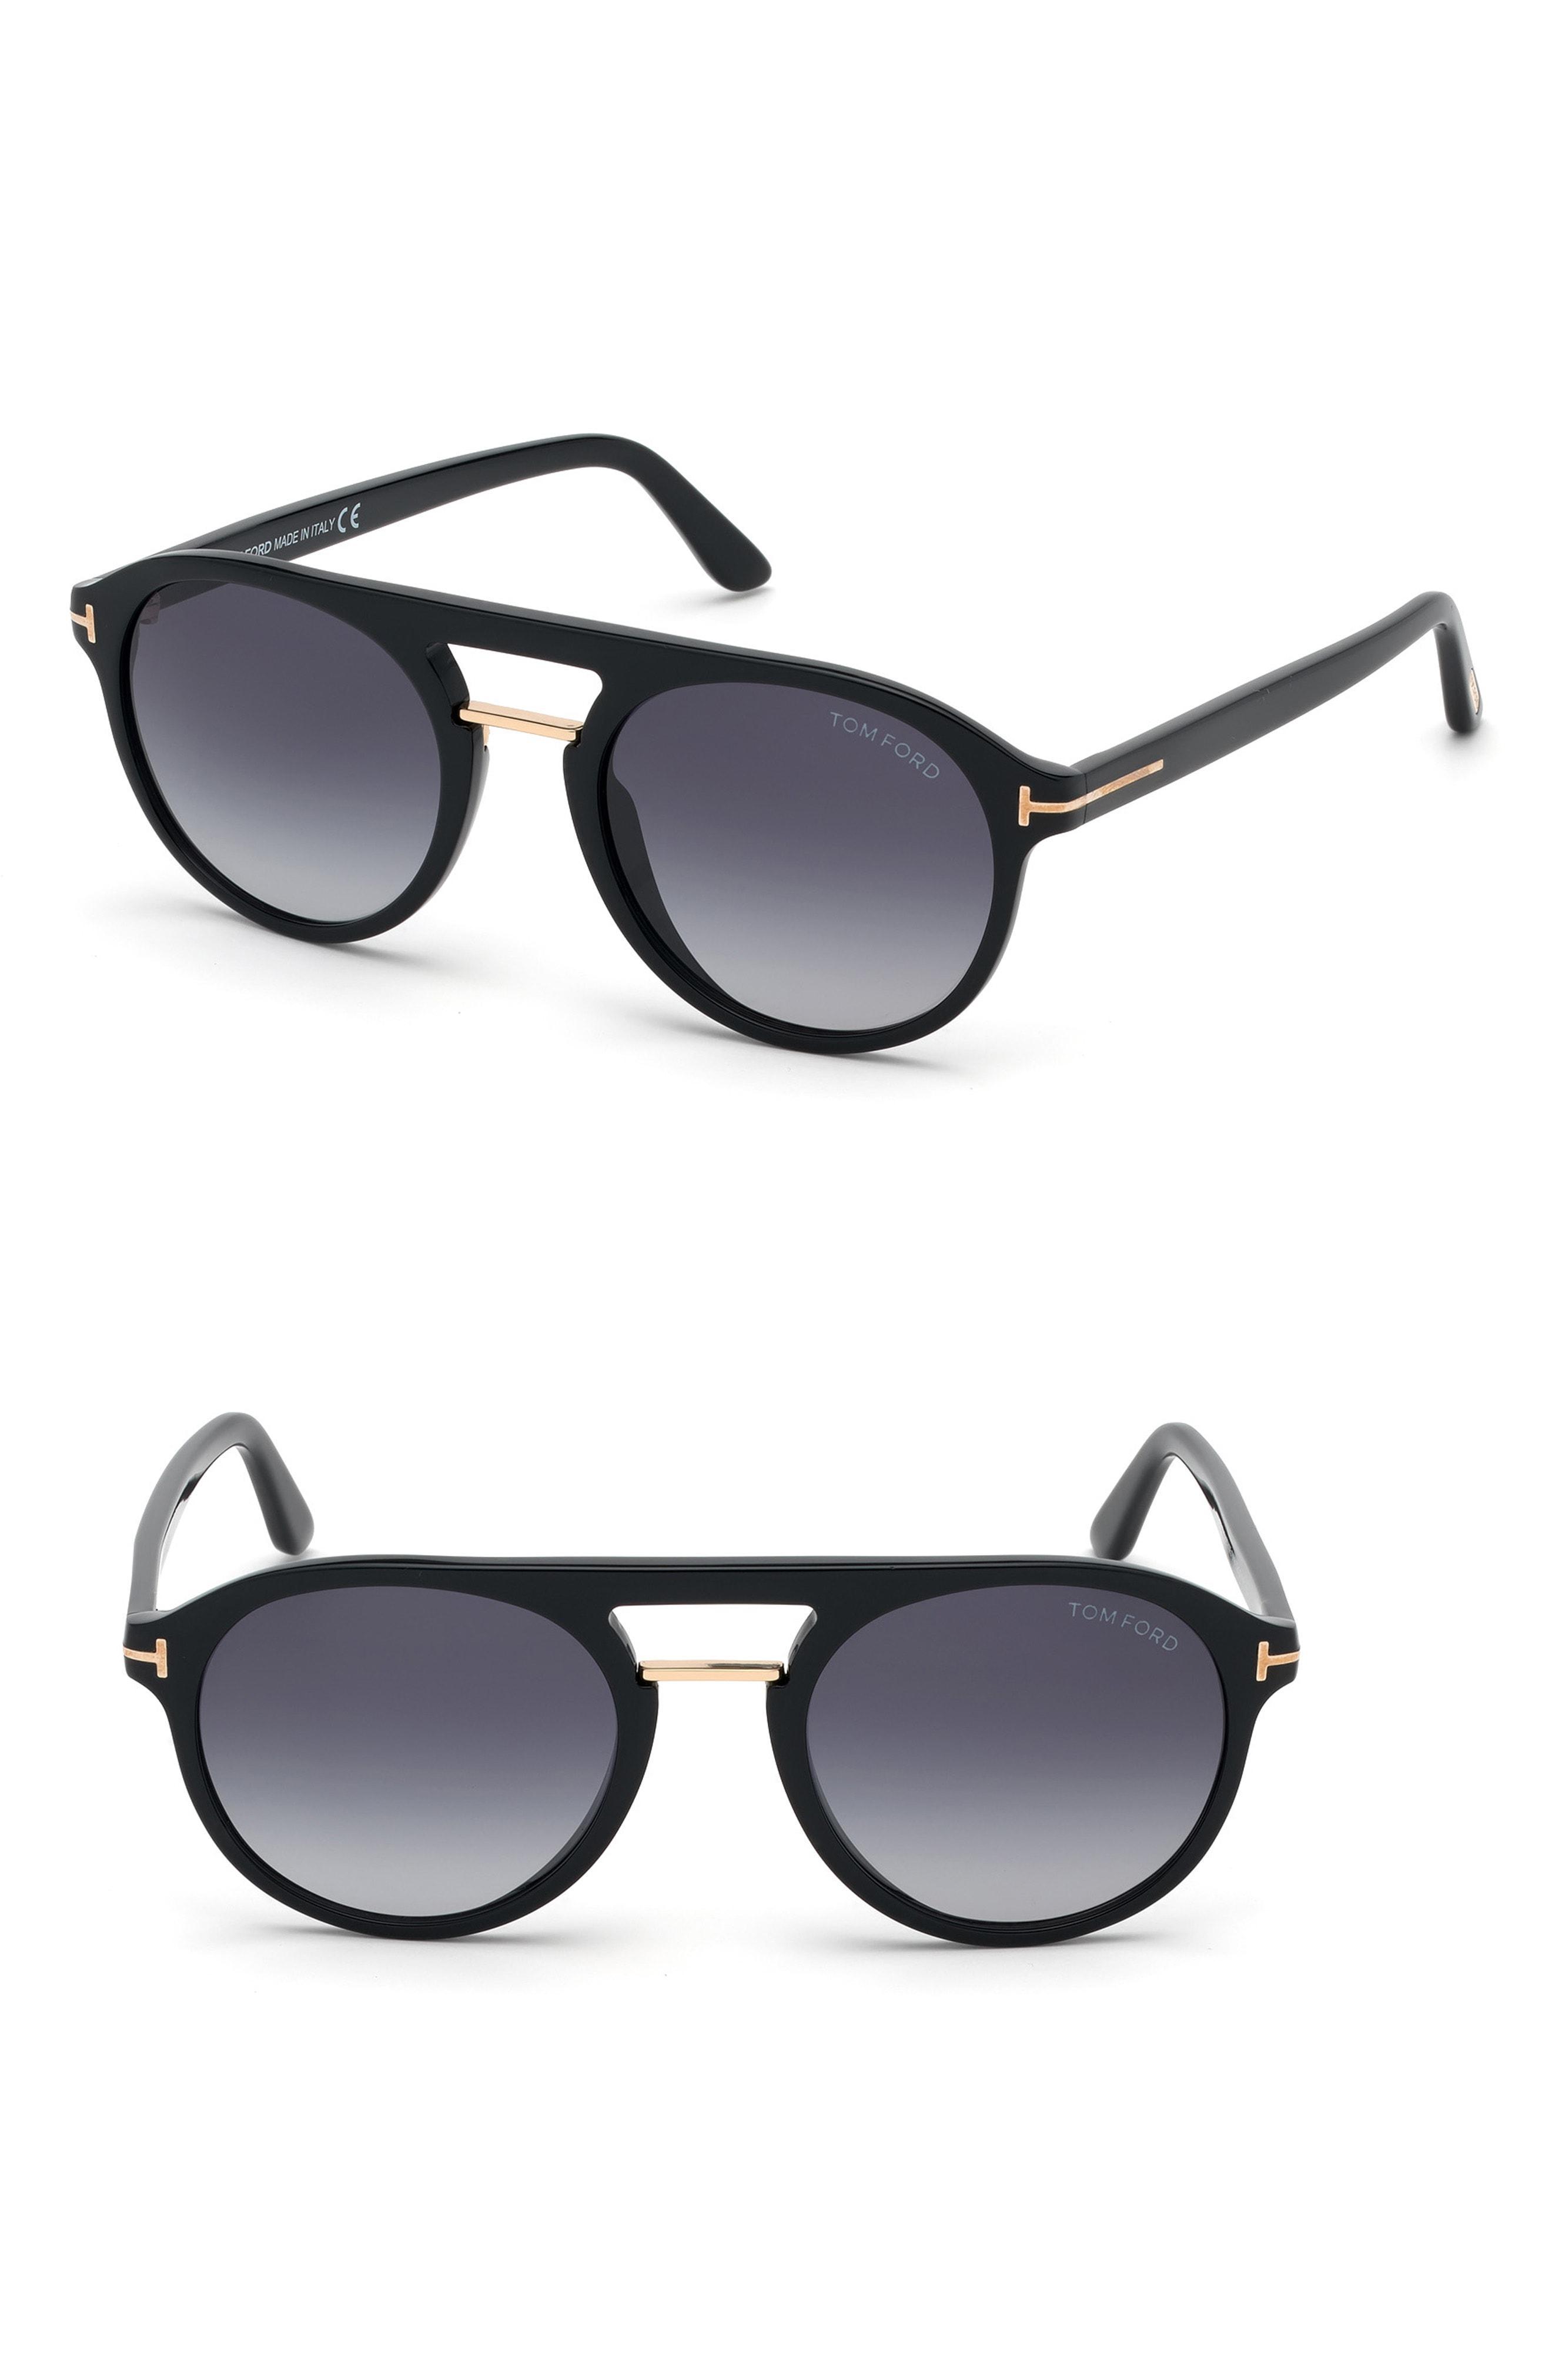 a4ad792d33 Lyst - Tom Ford Ivan 54mm Polarized Aviator Sunglasses - Shiny Black ...